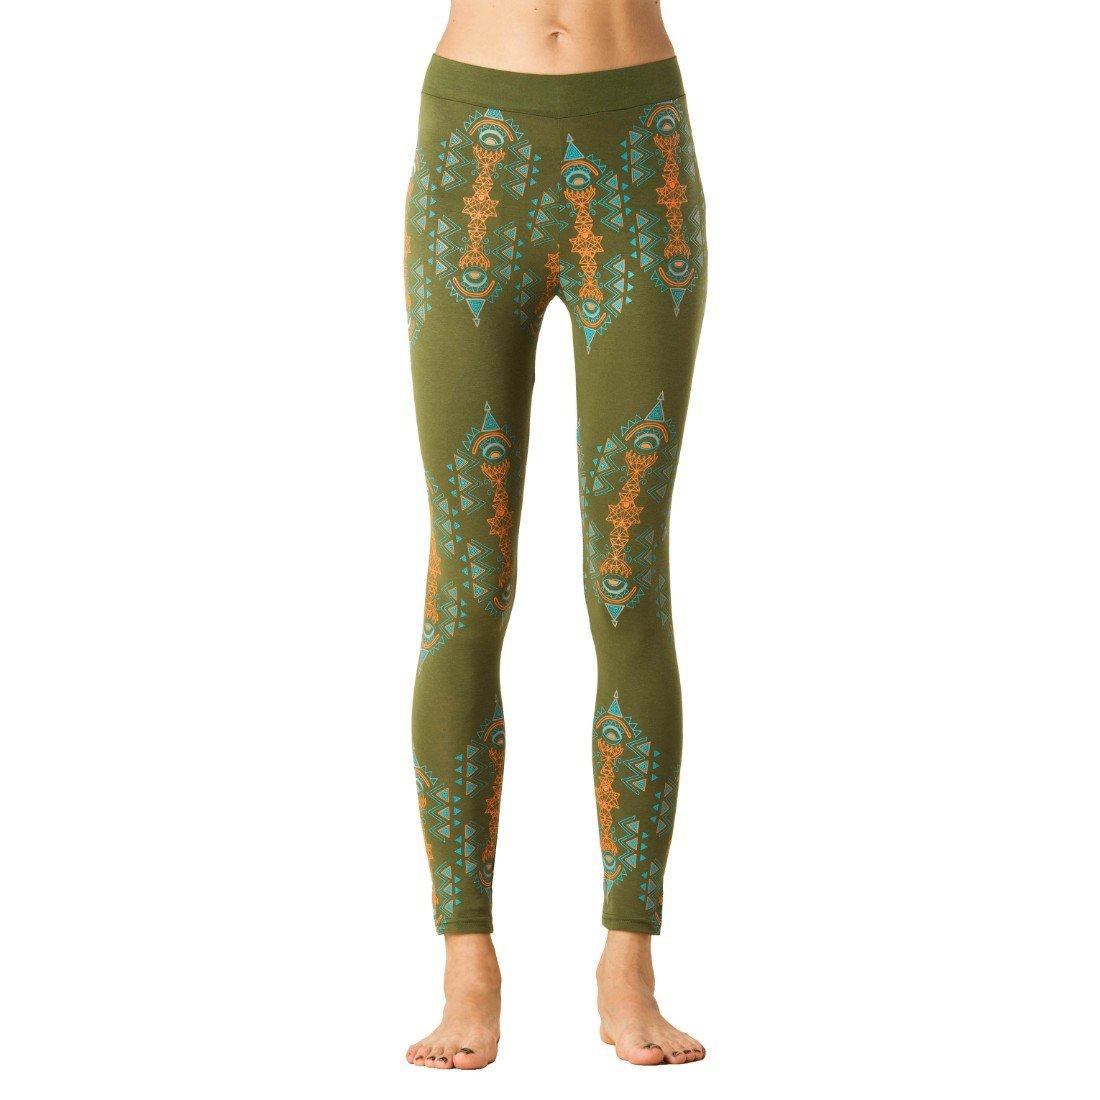 Colourbus Fractals Leggings Yoga Leggings